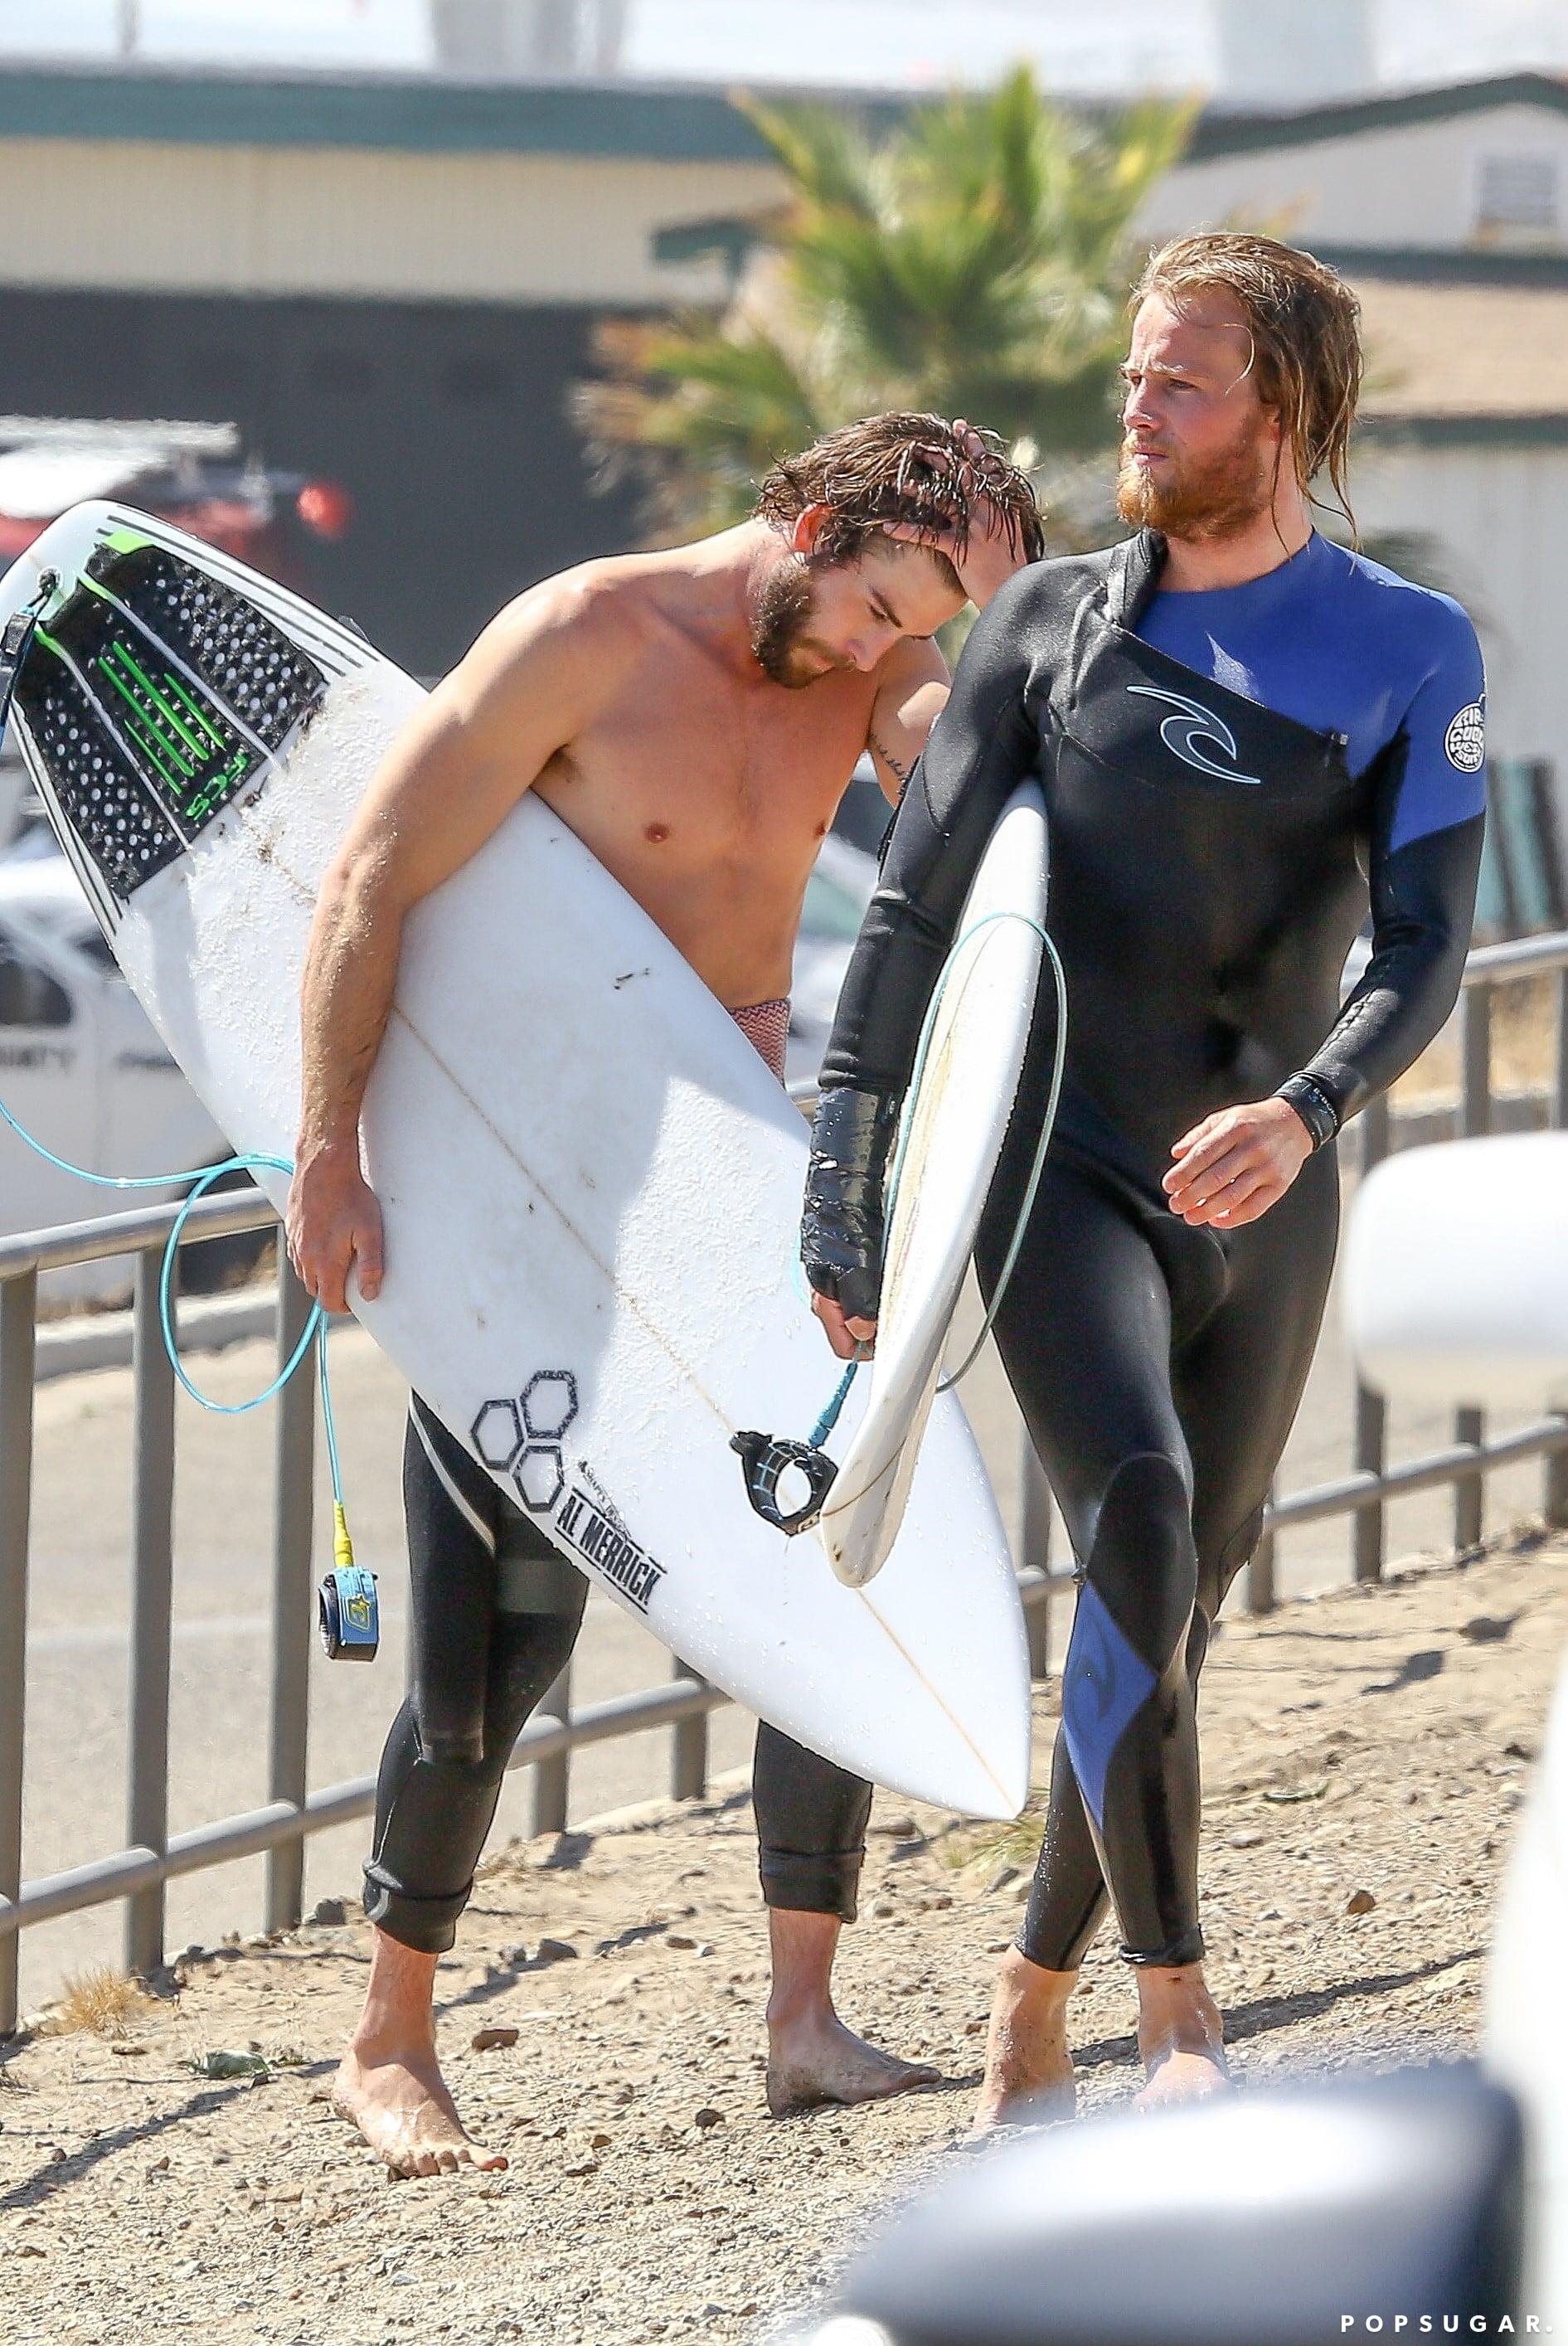 Liam Hemsworth Surfing In Malibu May 2017 Popsugar Celebrity